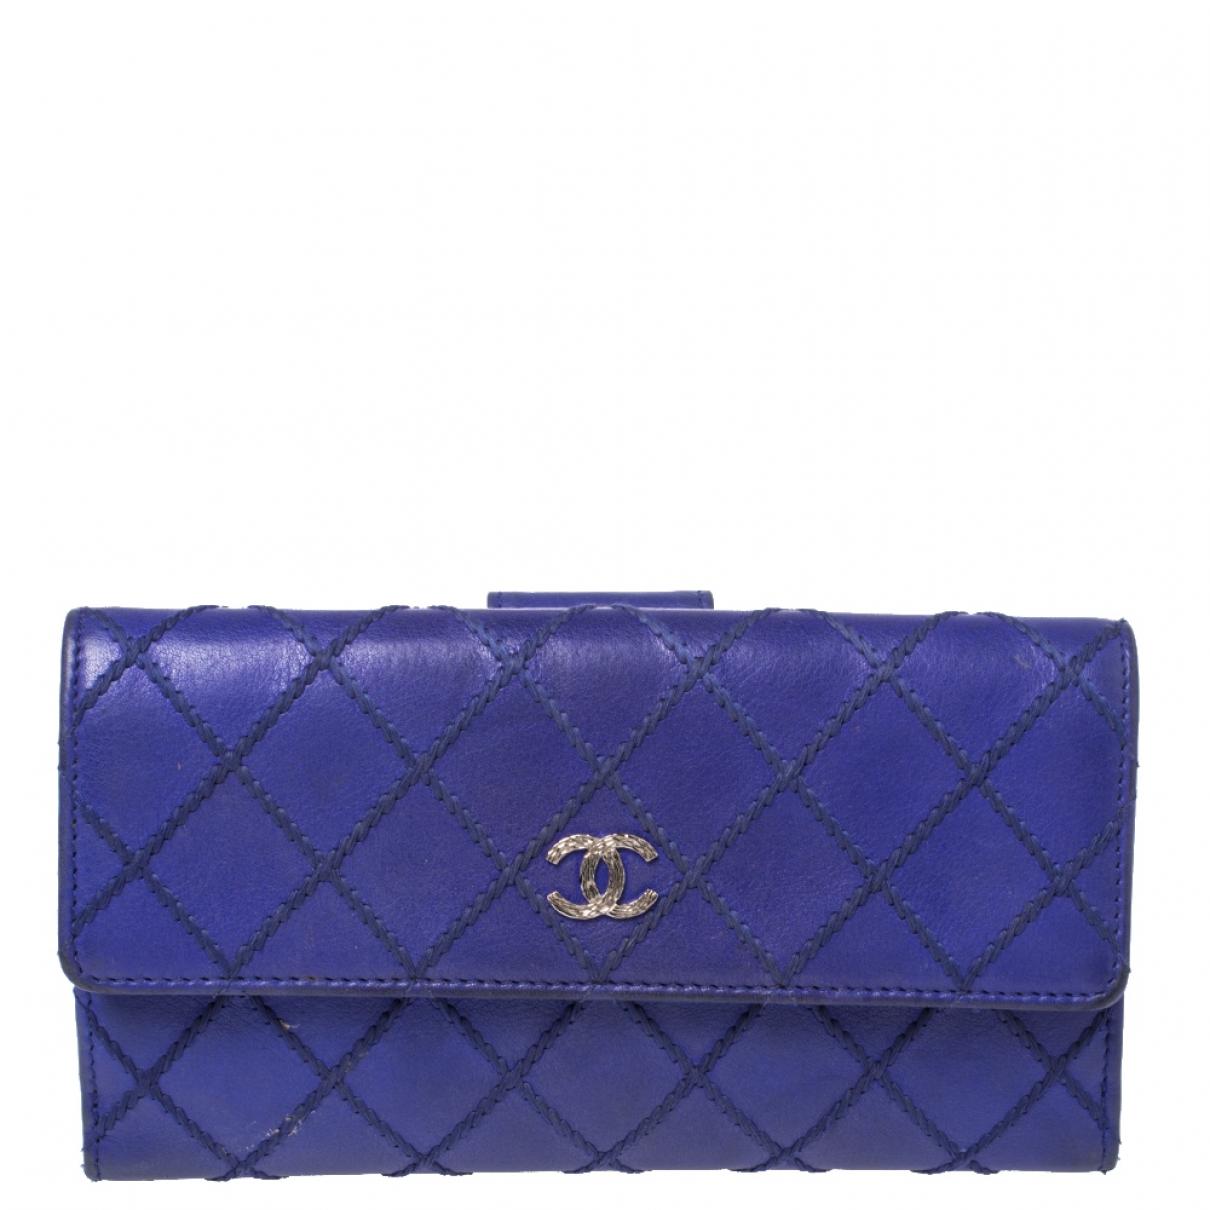 Chanel N Blue Leather wallet for Women N